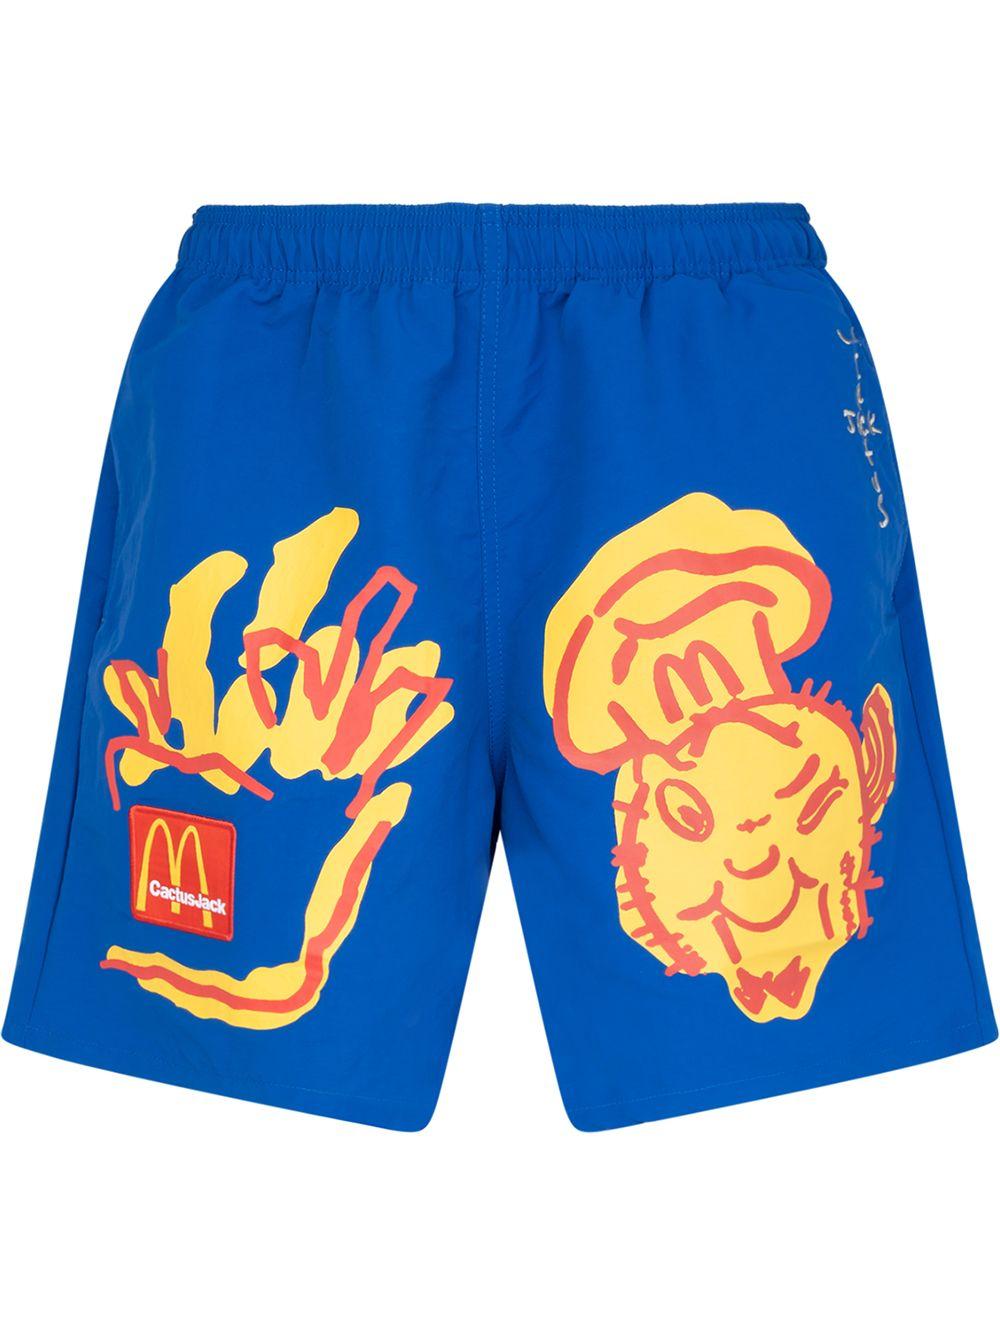 Travis Scott x McDonald's Illustration shorts - Blau